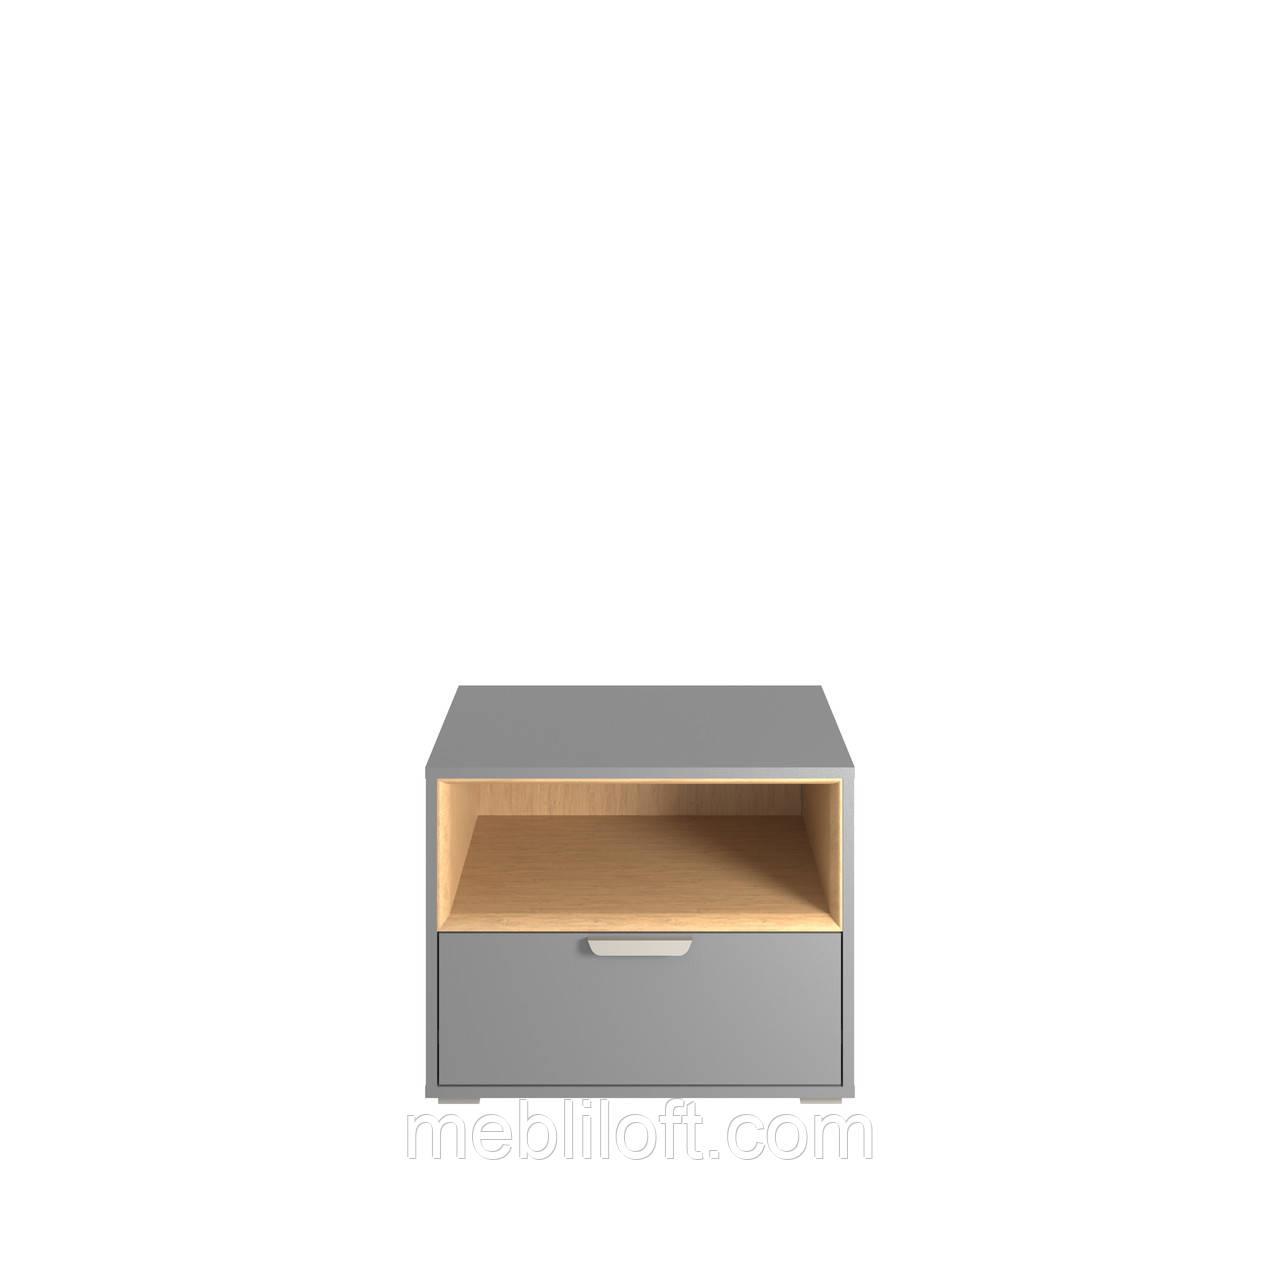 Шкафчик 1N1S  Арте / Arte Графит / дуб каменный